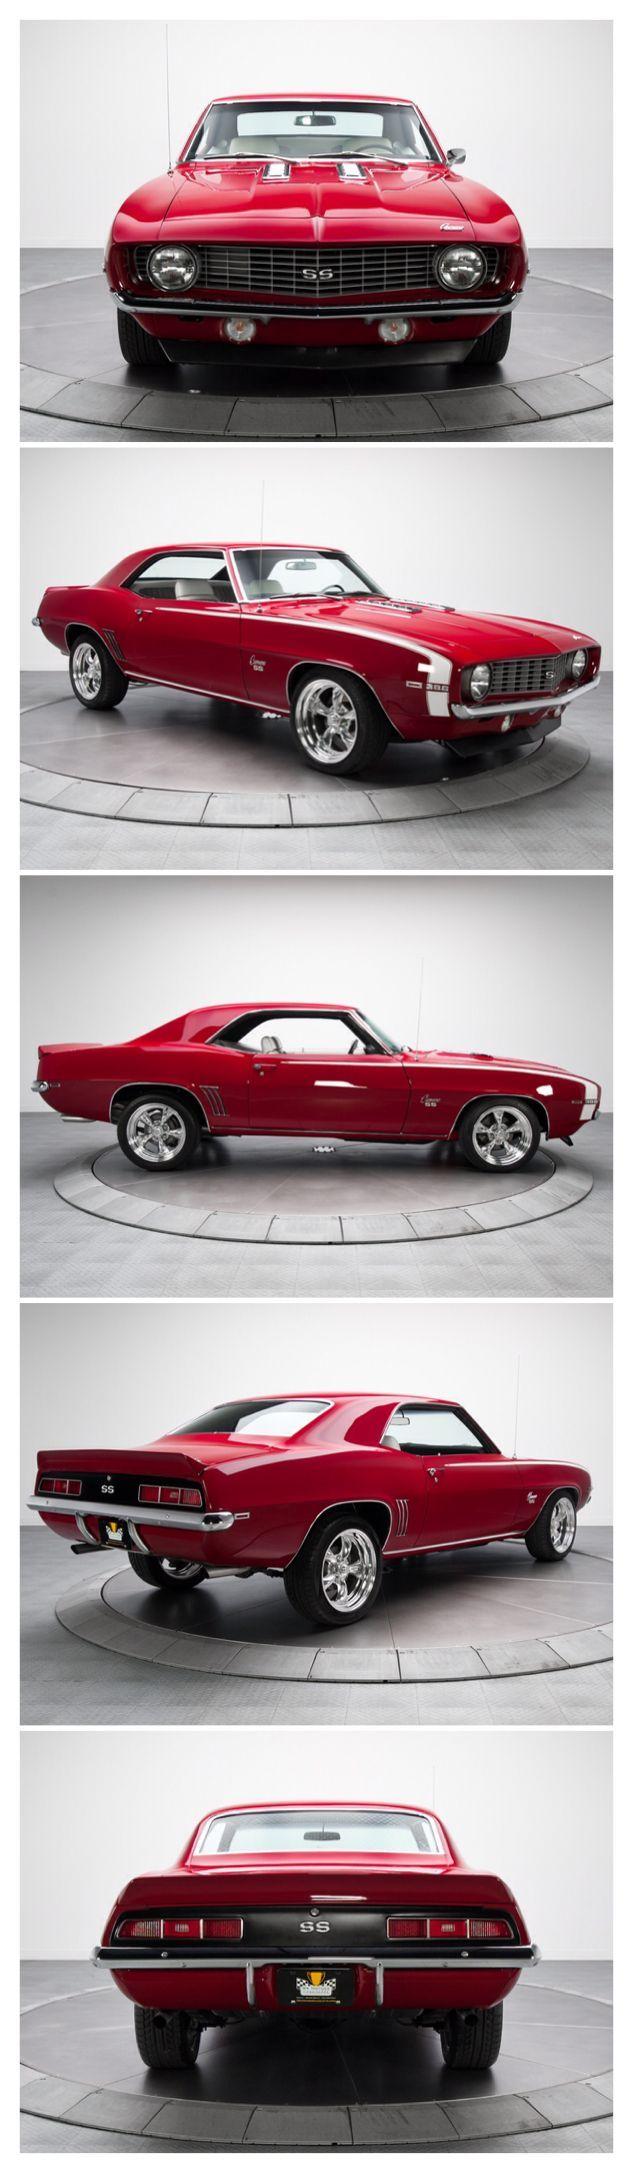 #quirkyrides.com #classiccar #chevrolet #camaro #camaro